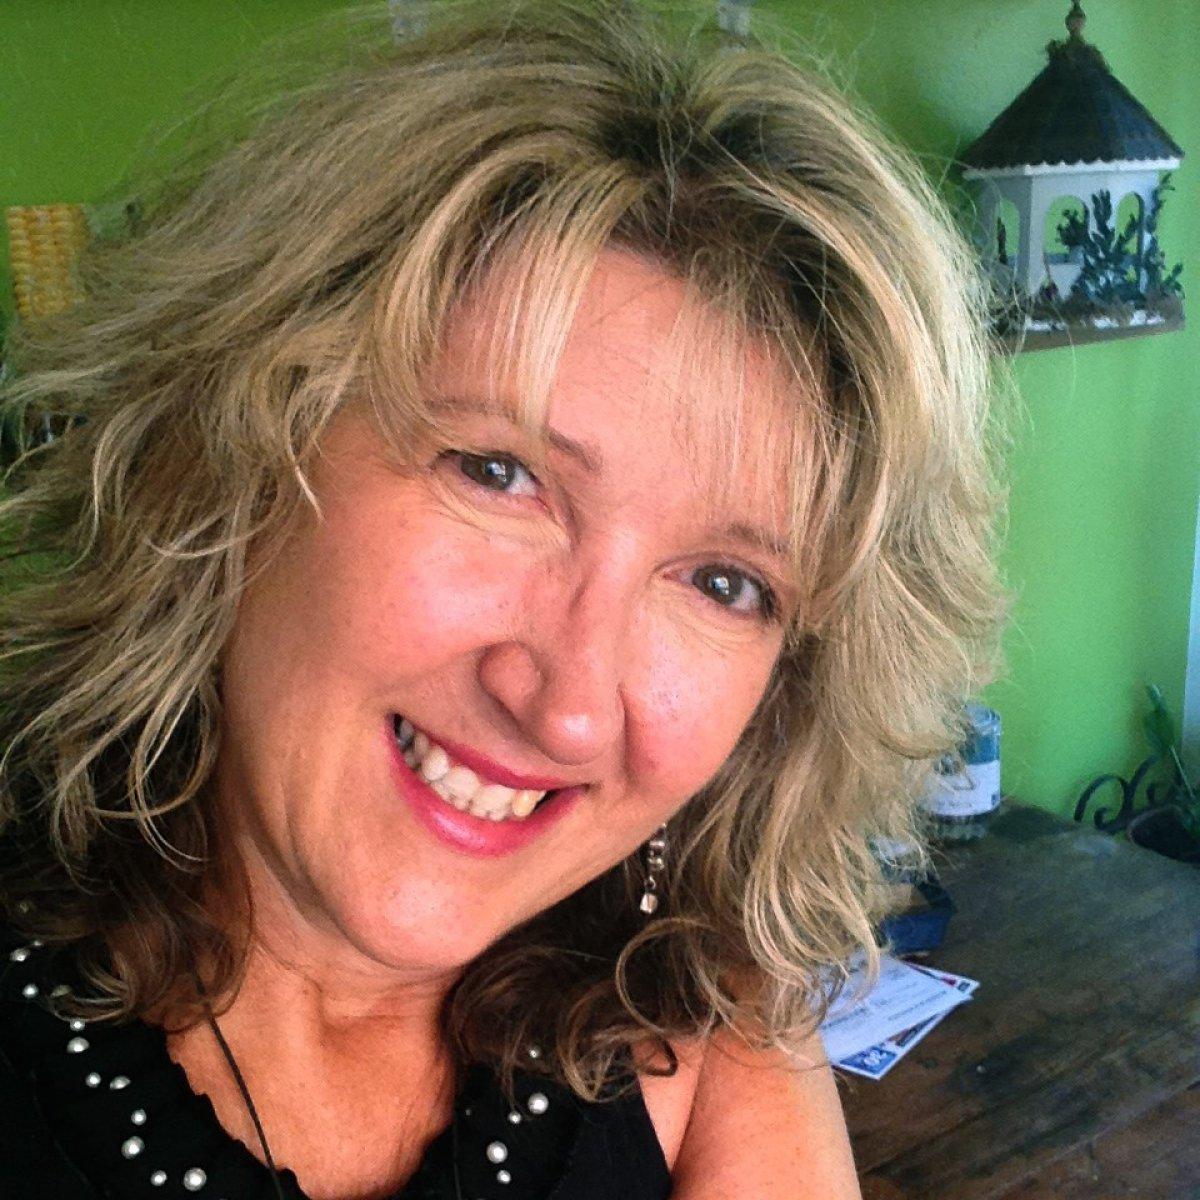 Suzanne Harle